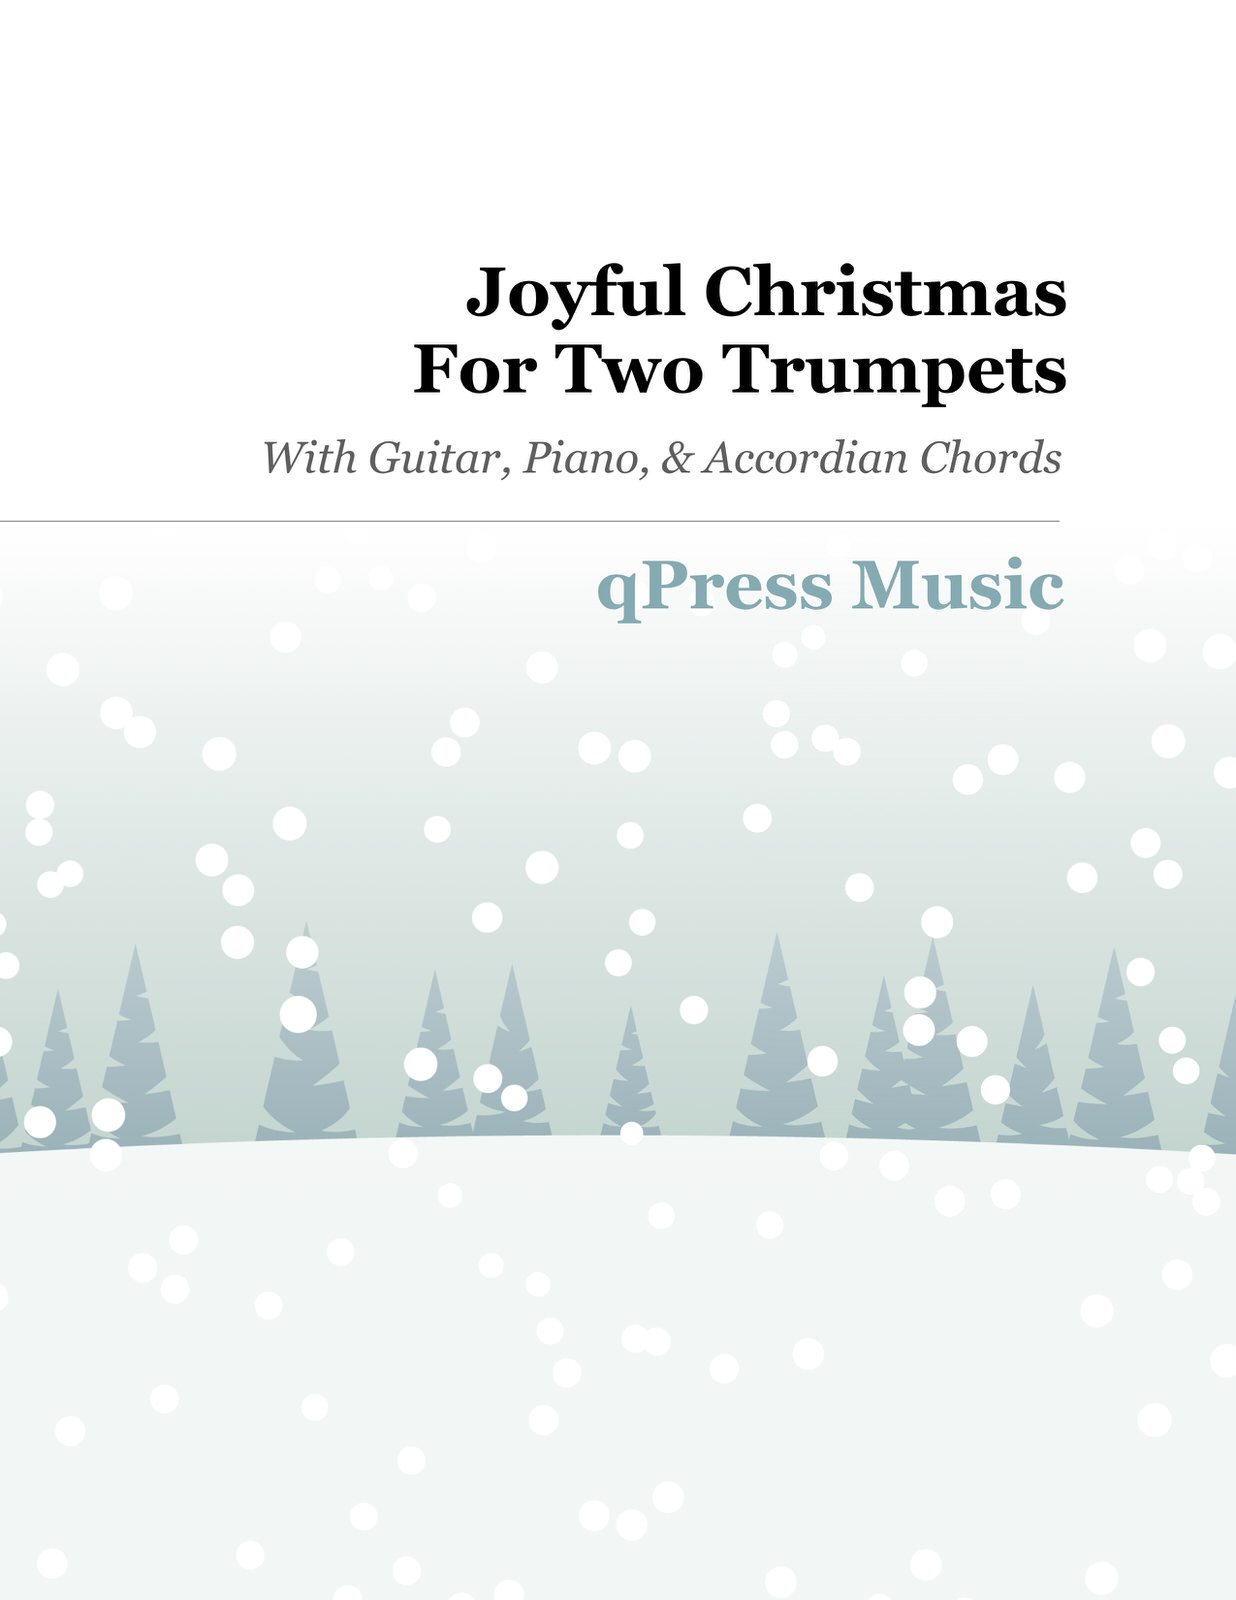 Joyful Christmas for Two Trumpets